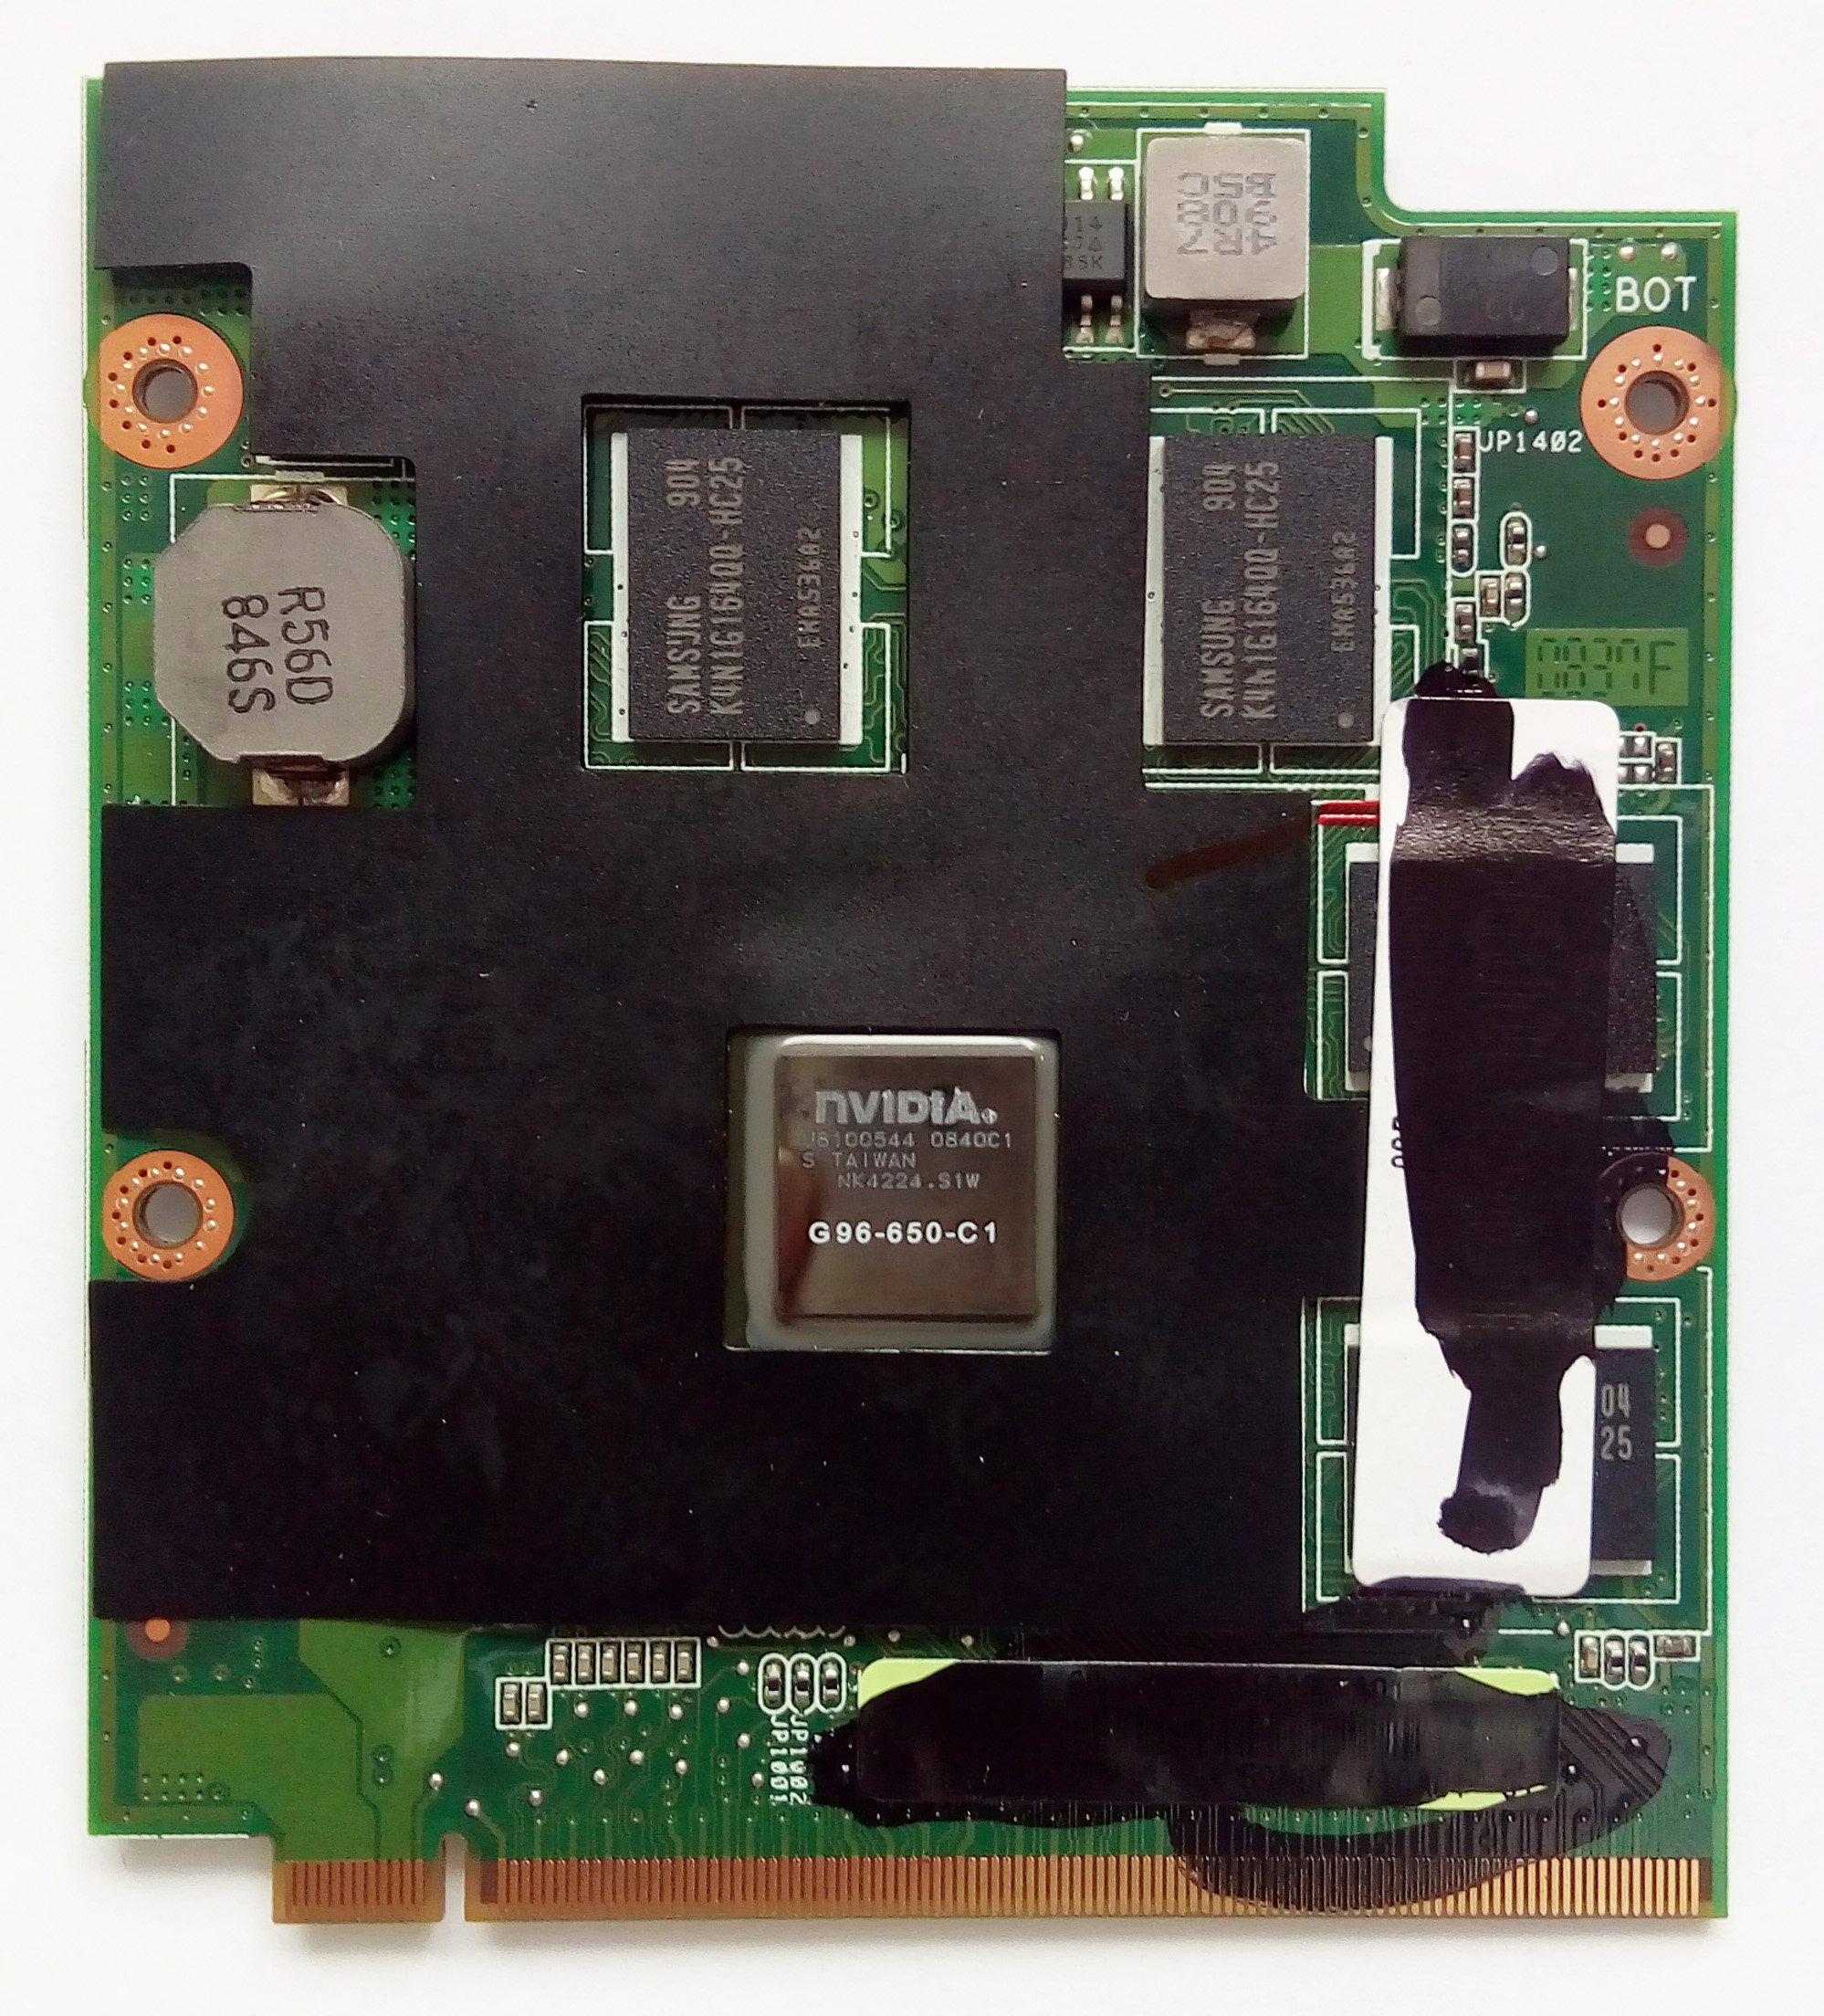 1G Laptop VGA Graphic Card G96-650-C1 for Asus N80VN Laptop 90R-NSWVG1000Y